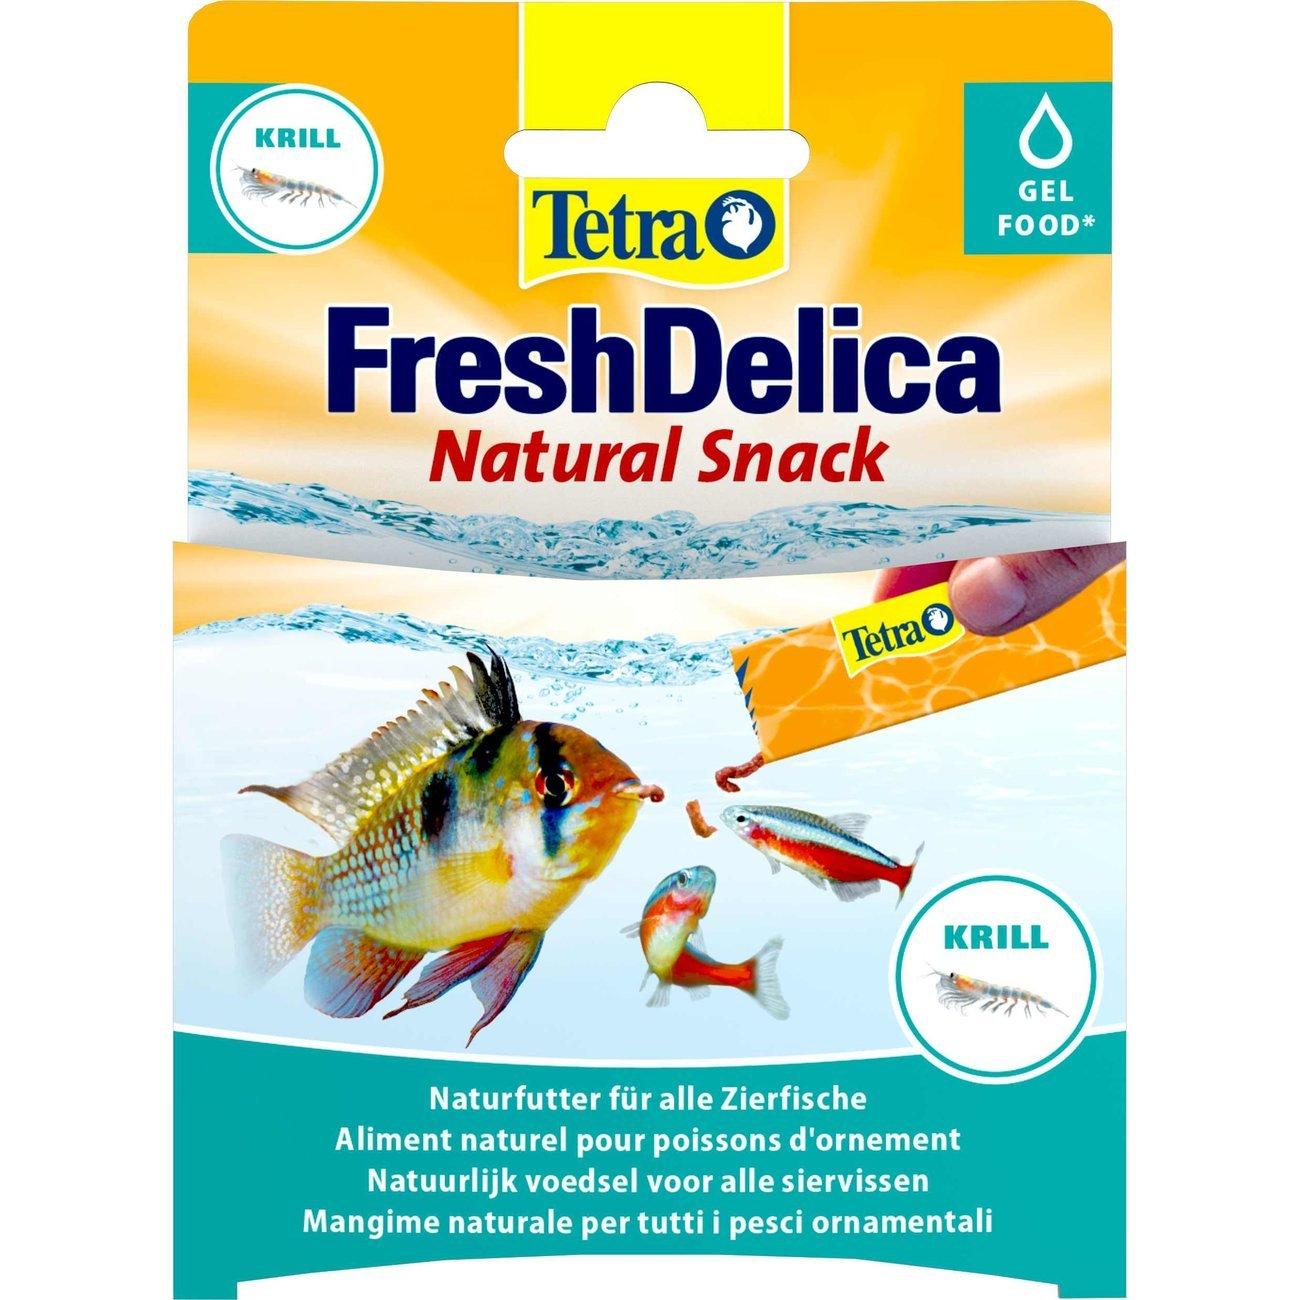 Tetra FreshDelica Gelee, Krill, 48 g